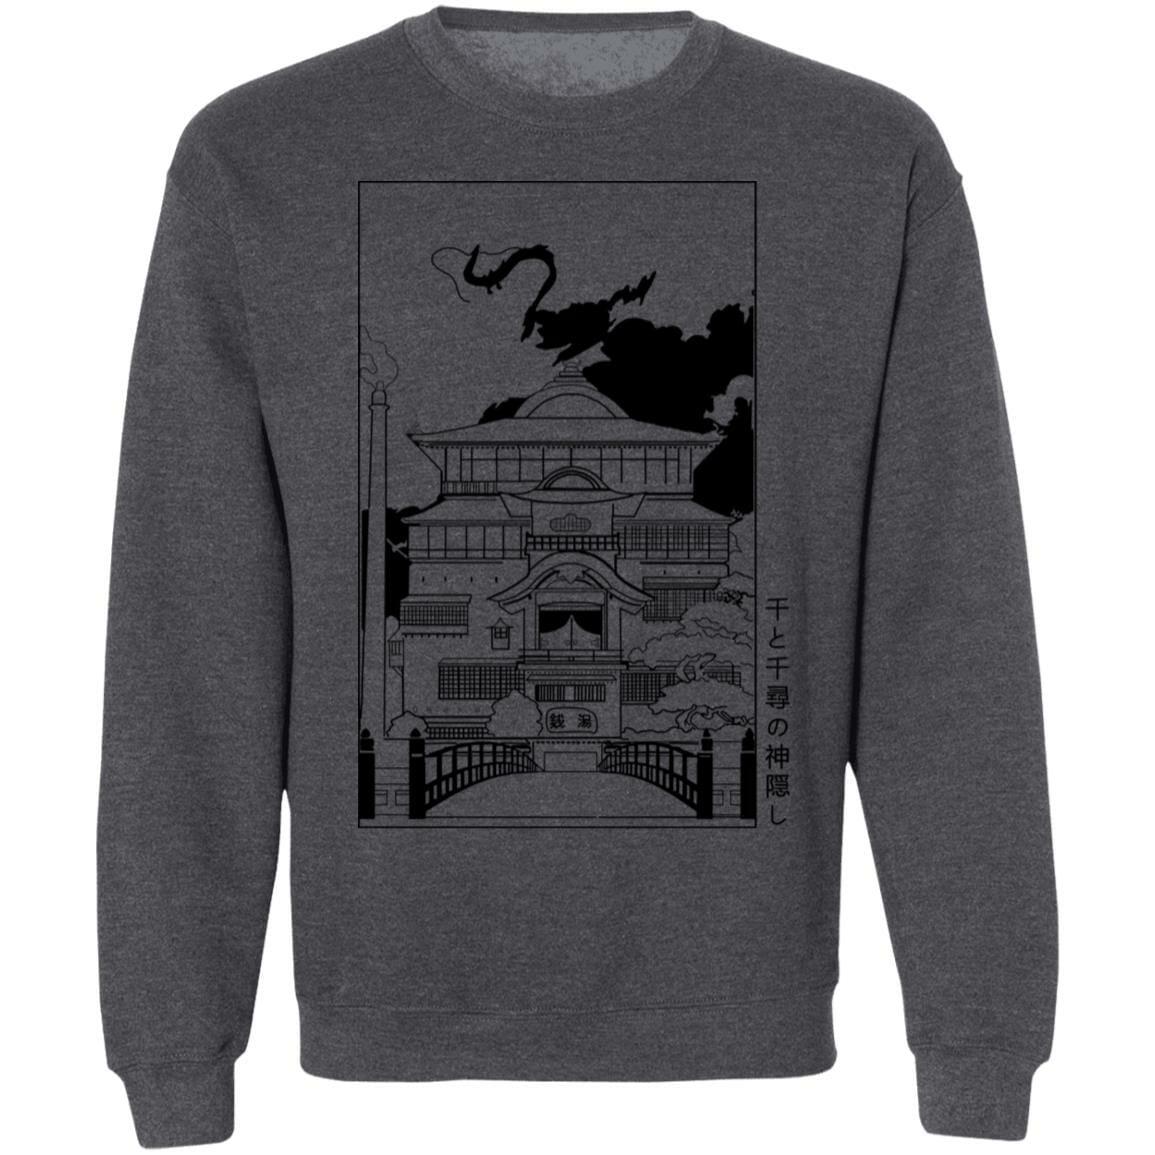 Spirited Away Bathhouse illustrated Graphic Sweatshirt